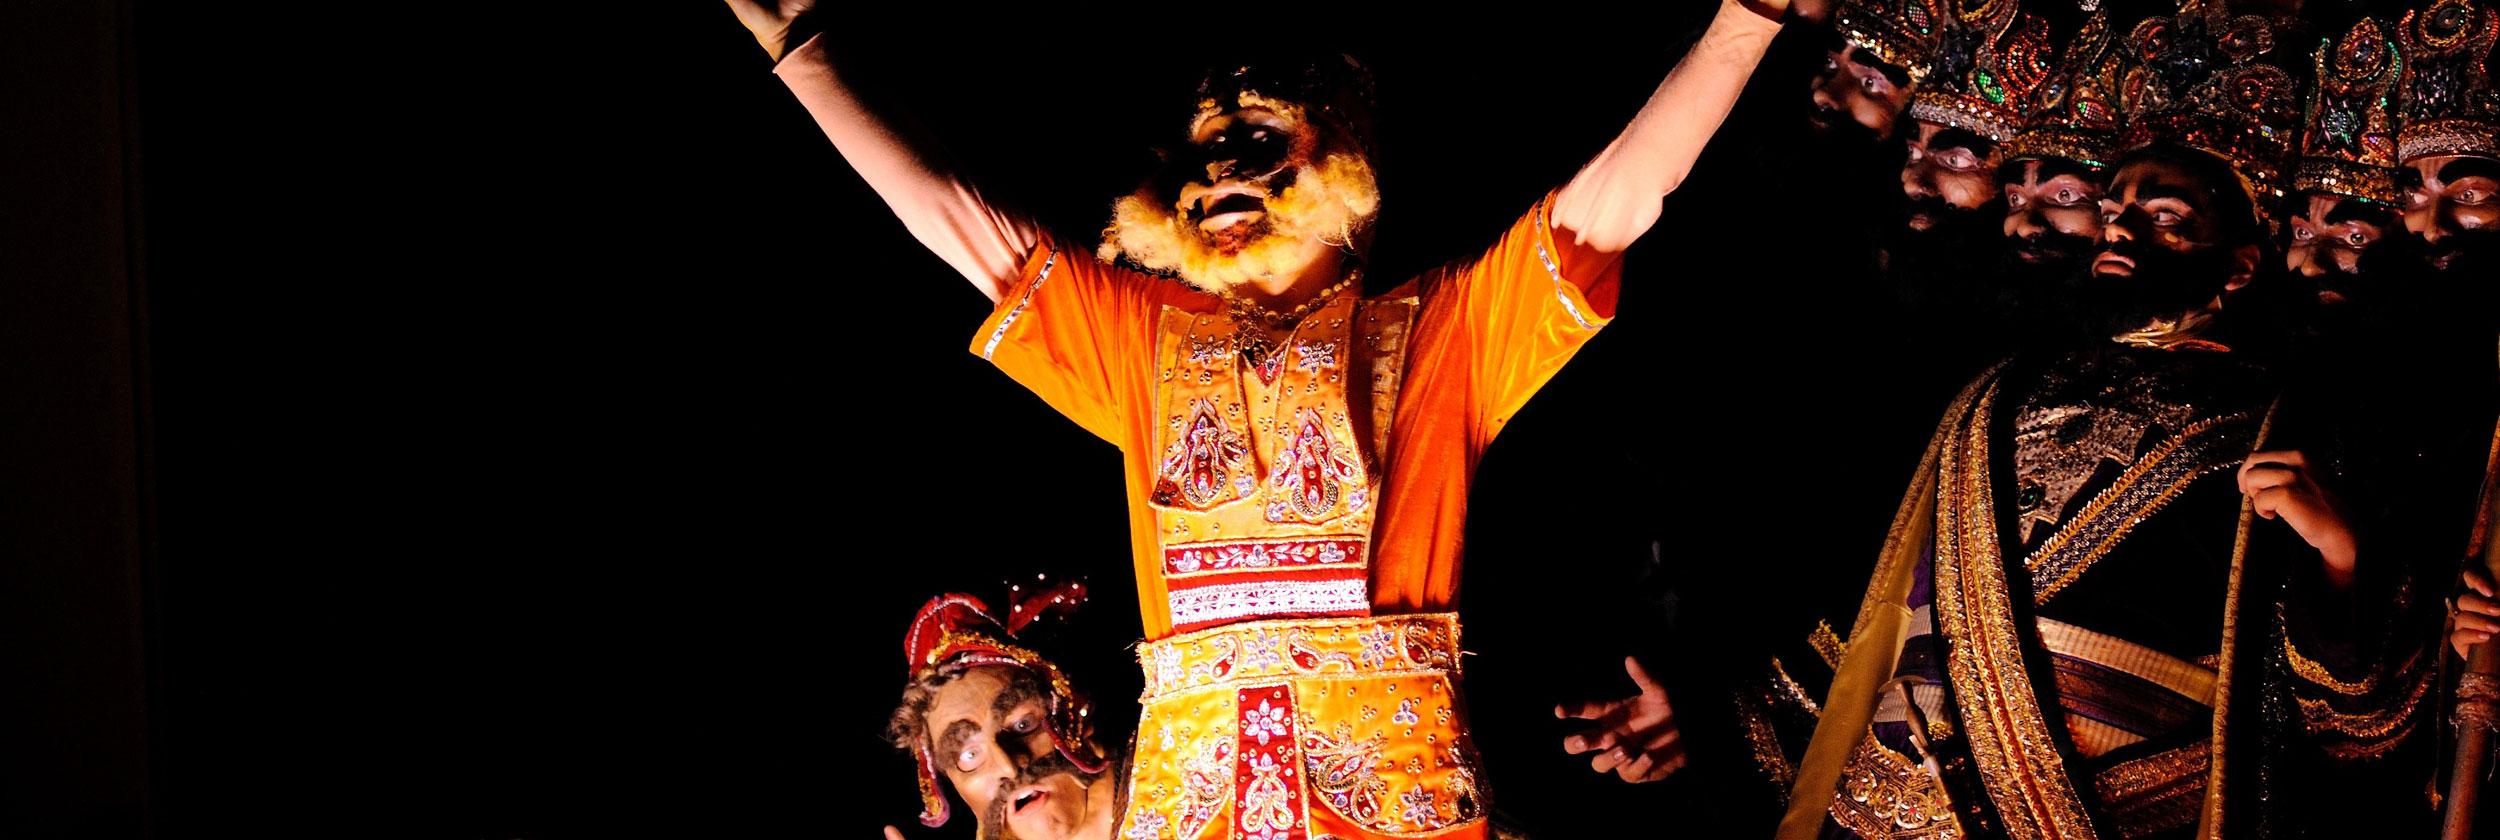 2012 <i>Ramayana!</i> Video Download